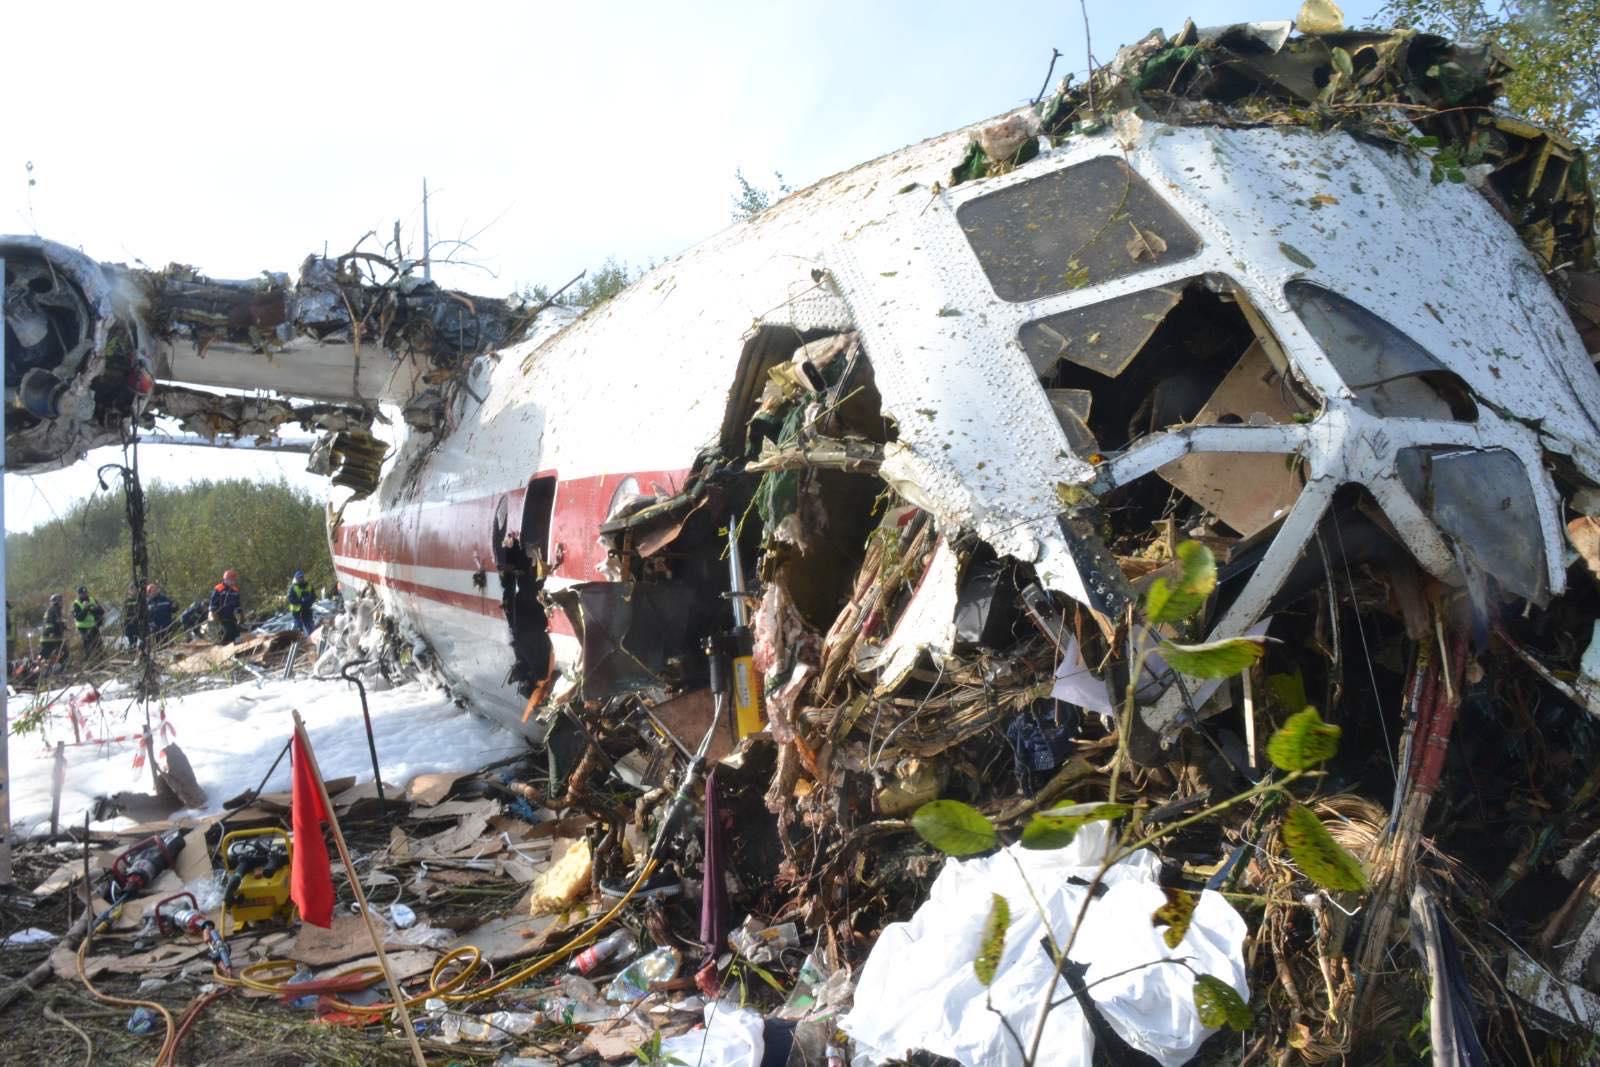 самолет крушение репортаж фото